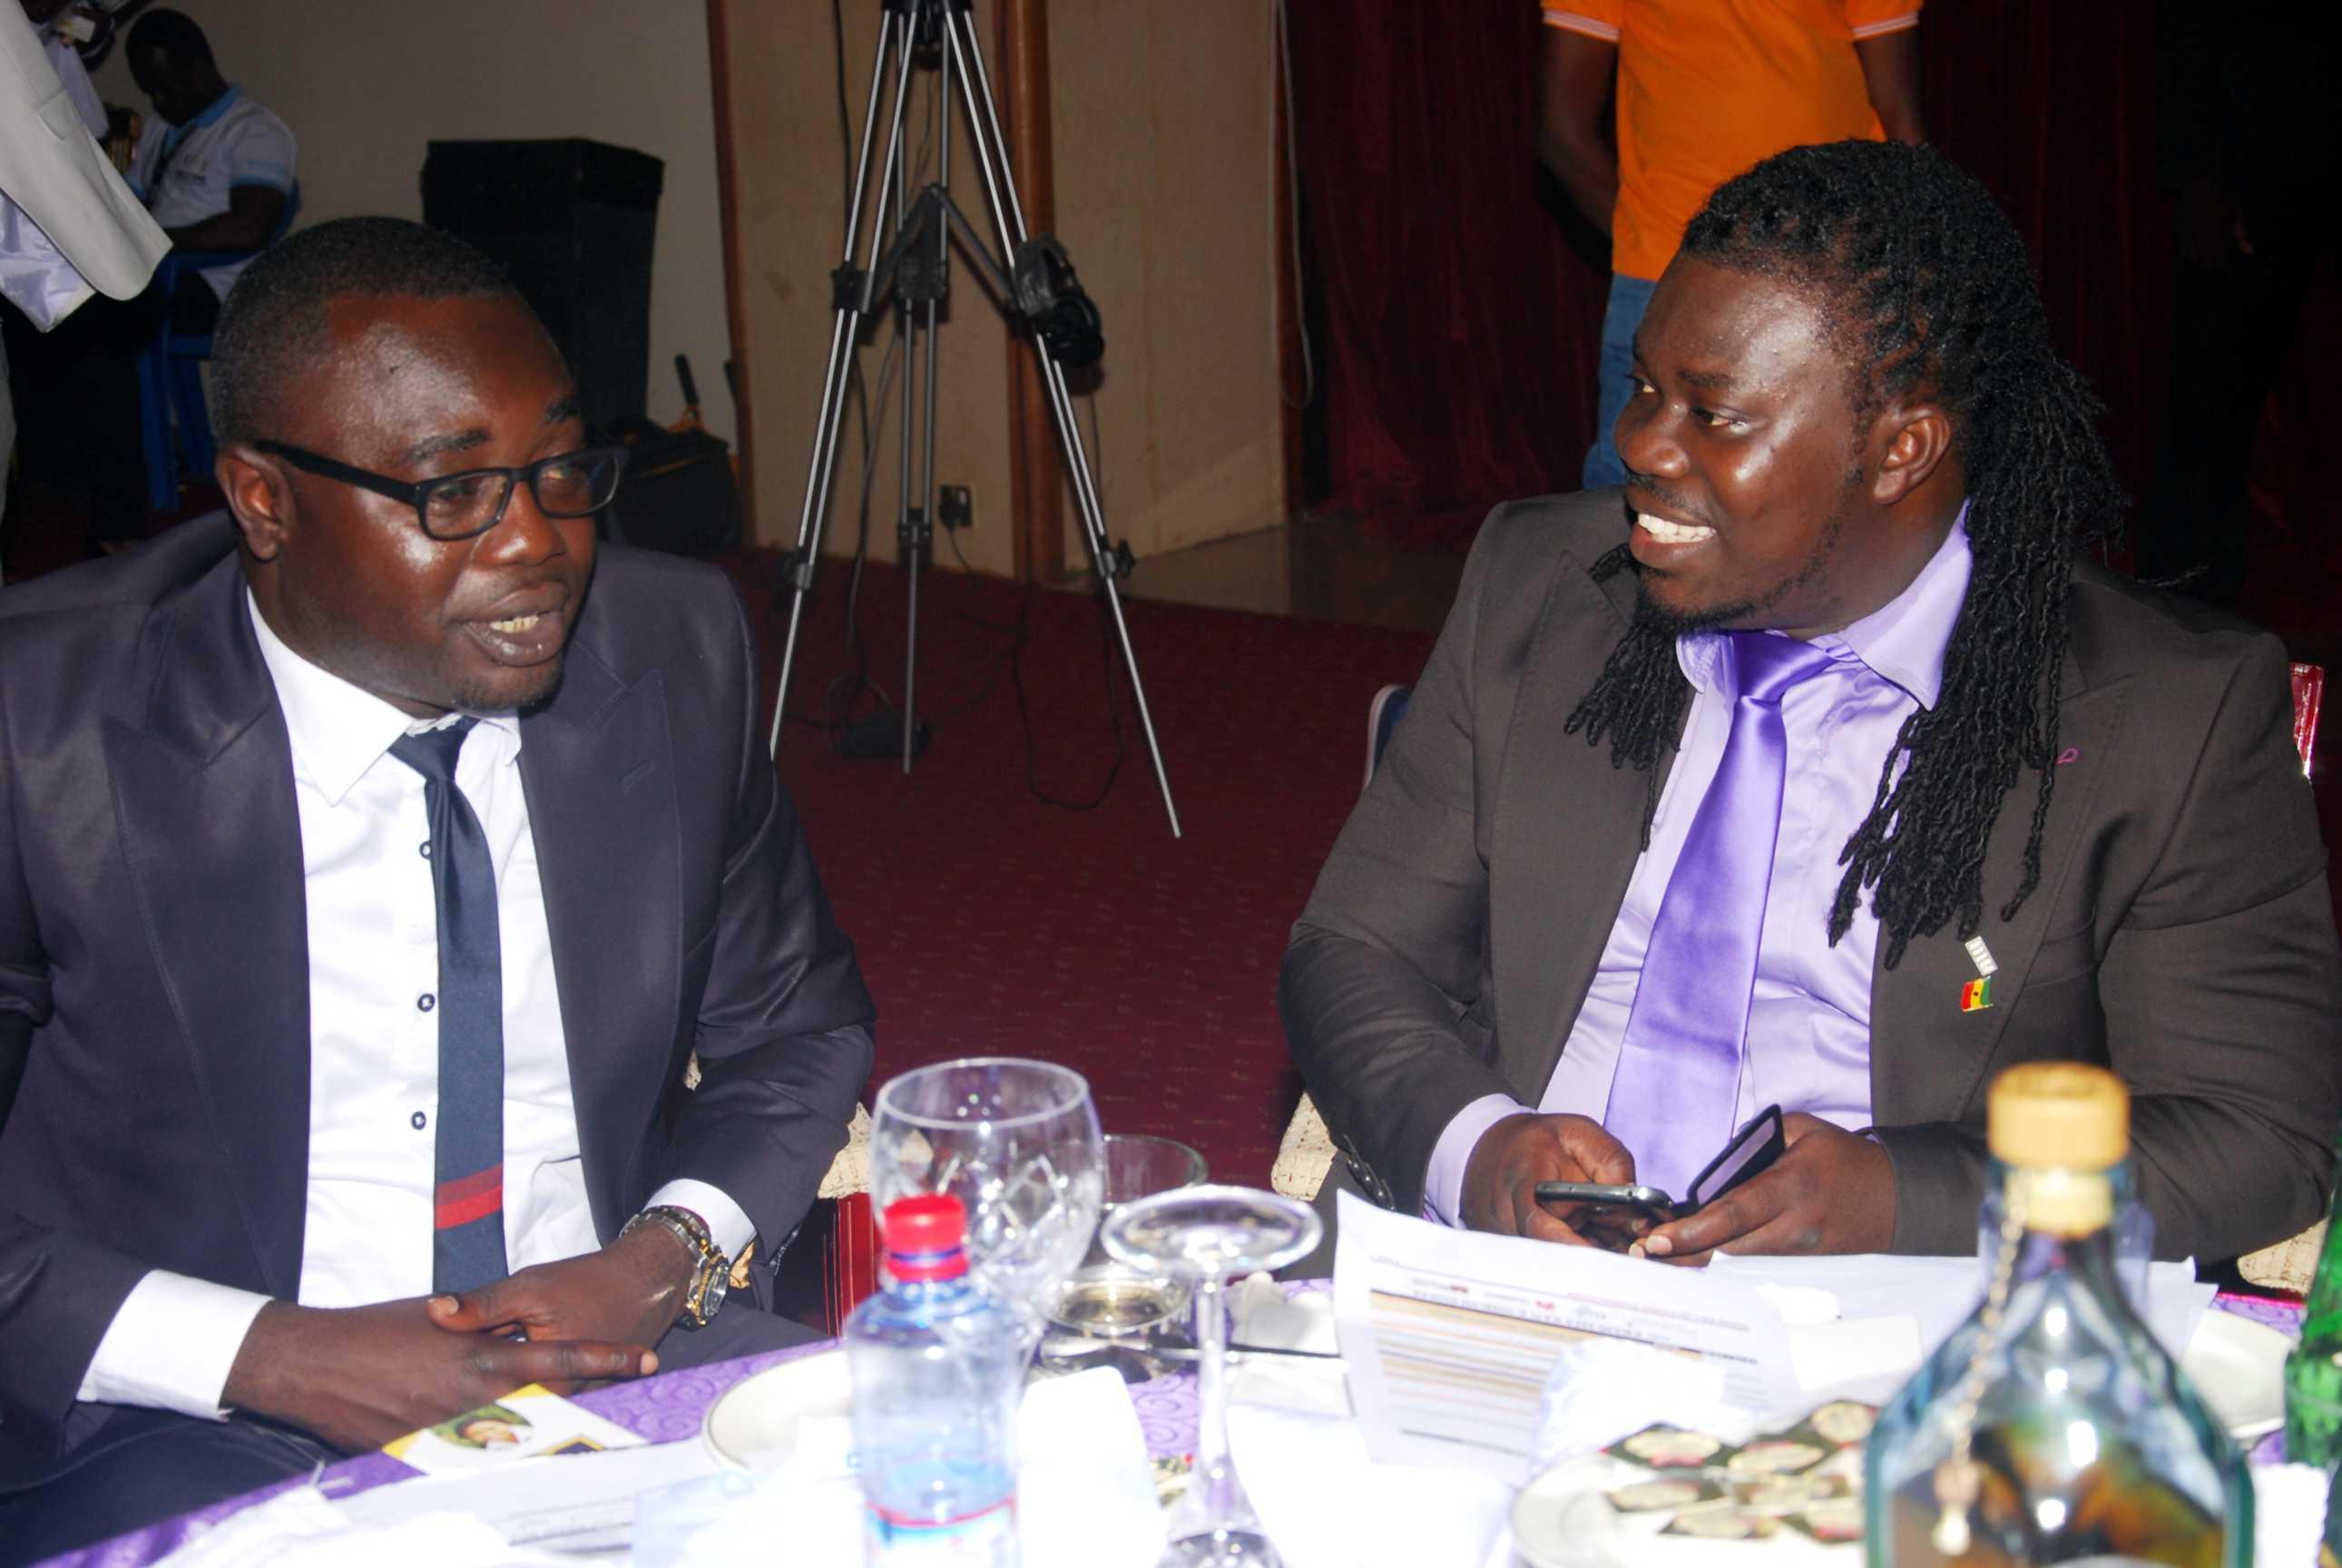 Chairman Afari and Obour